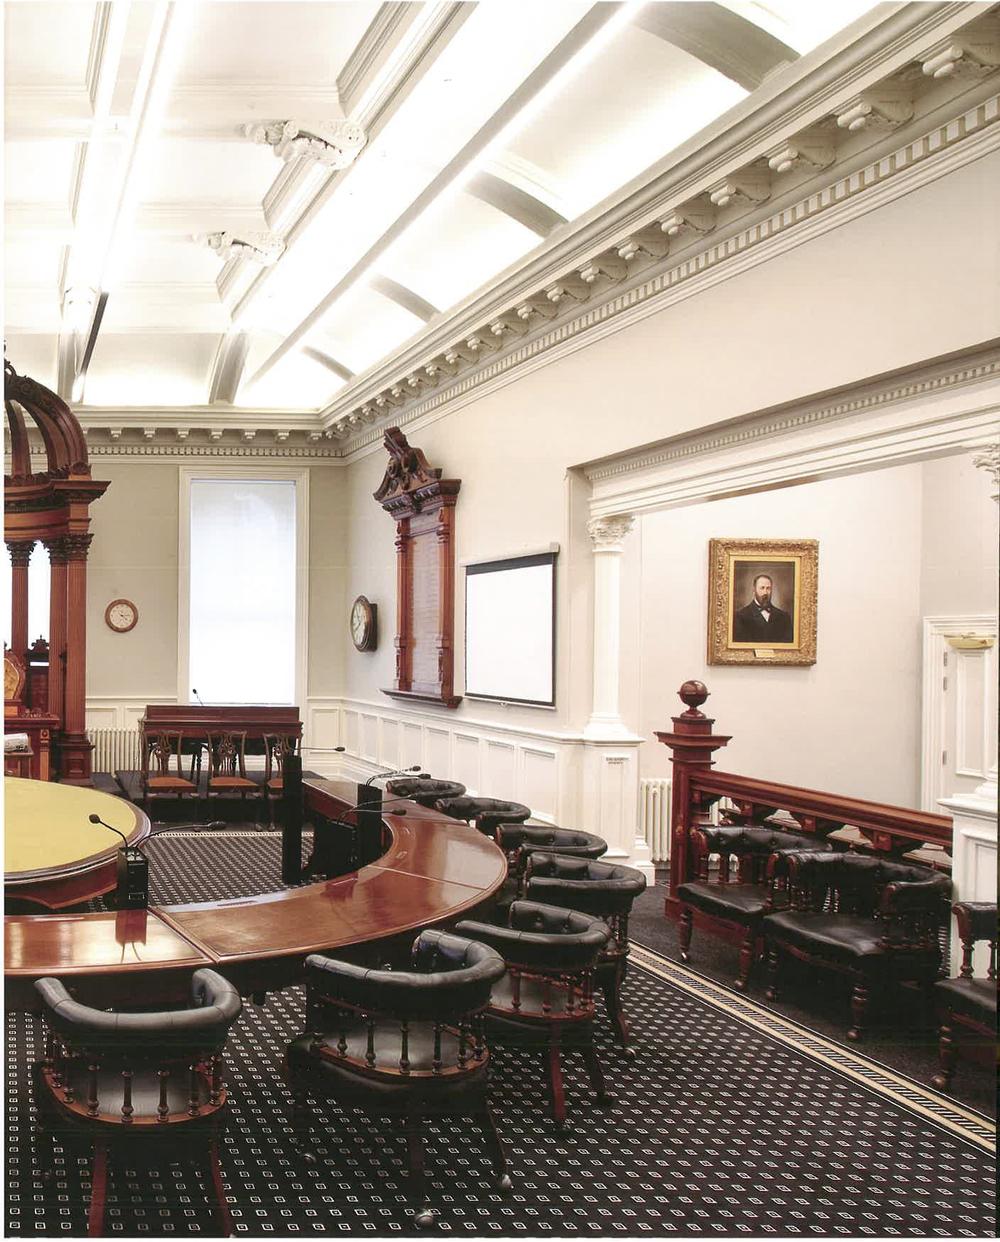 Dunedin Town Hall - Interiors Article Dec - Feb 2014 - 2015_8.jpg